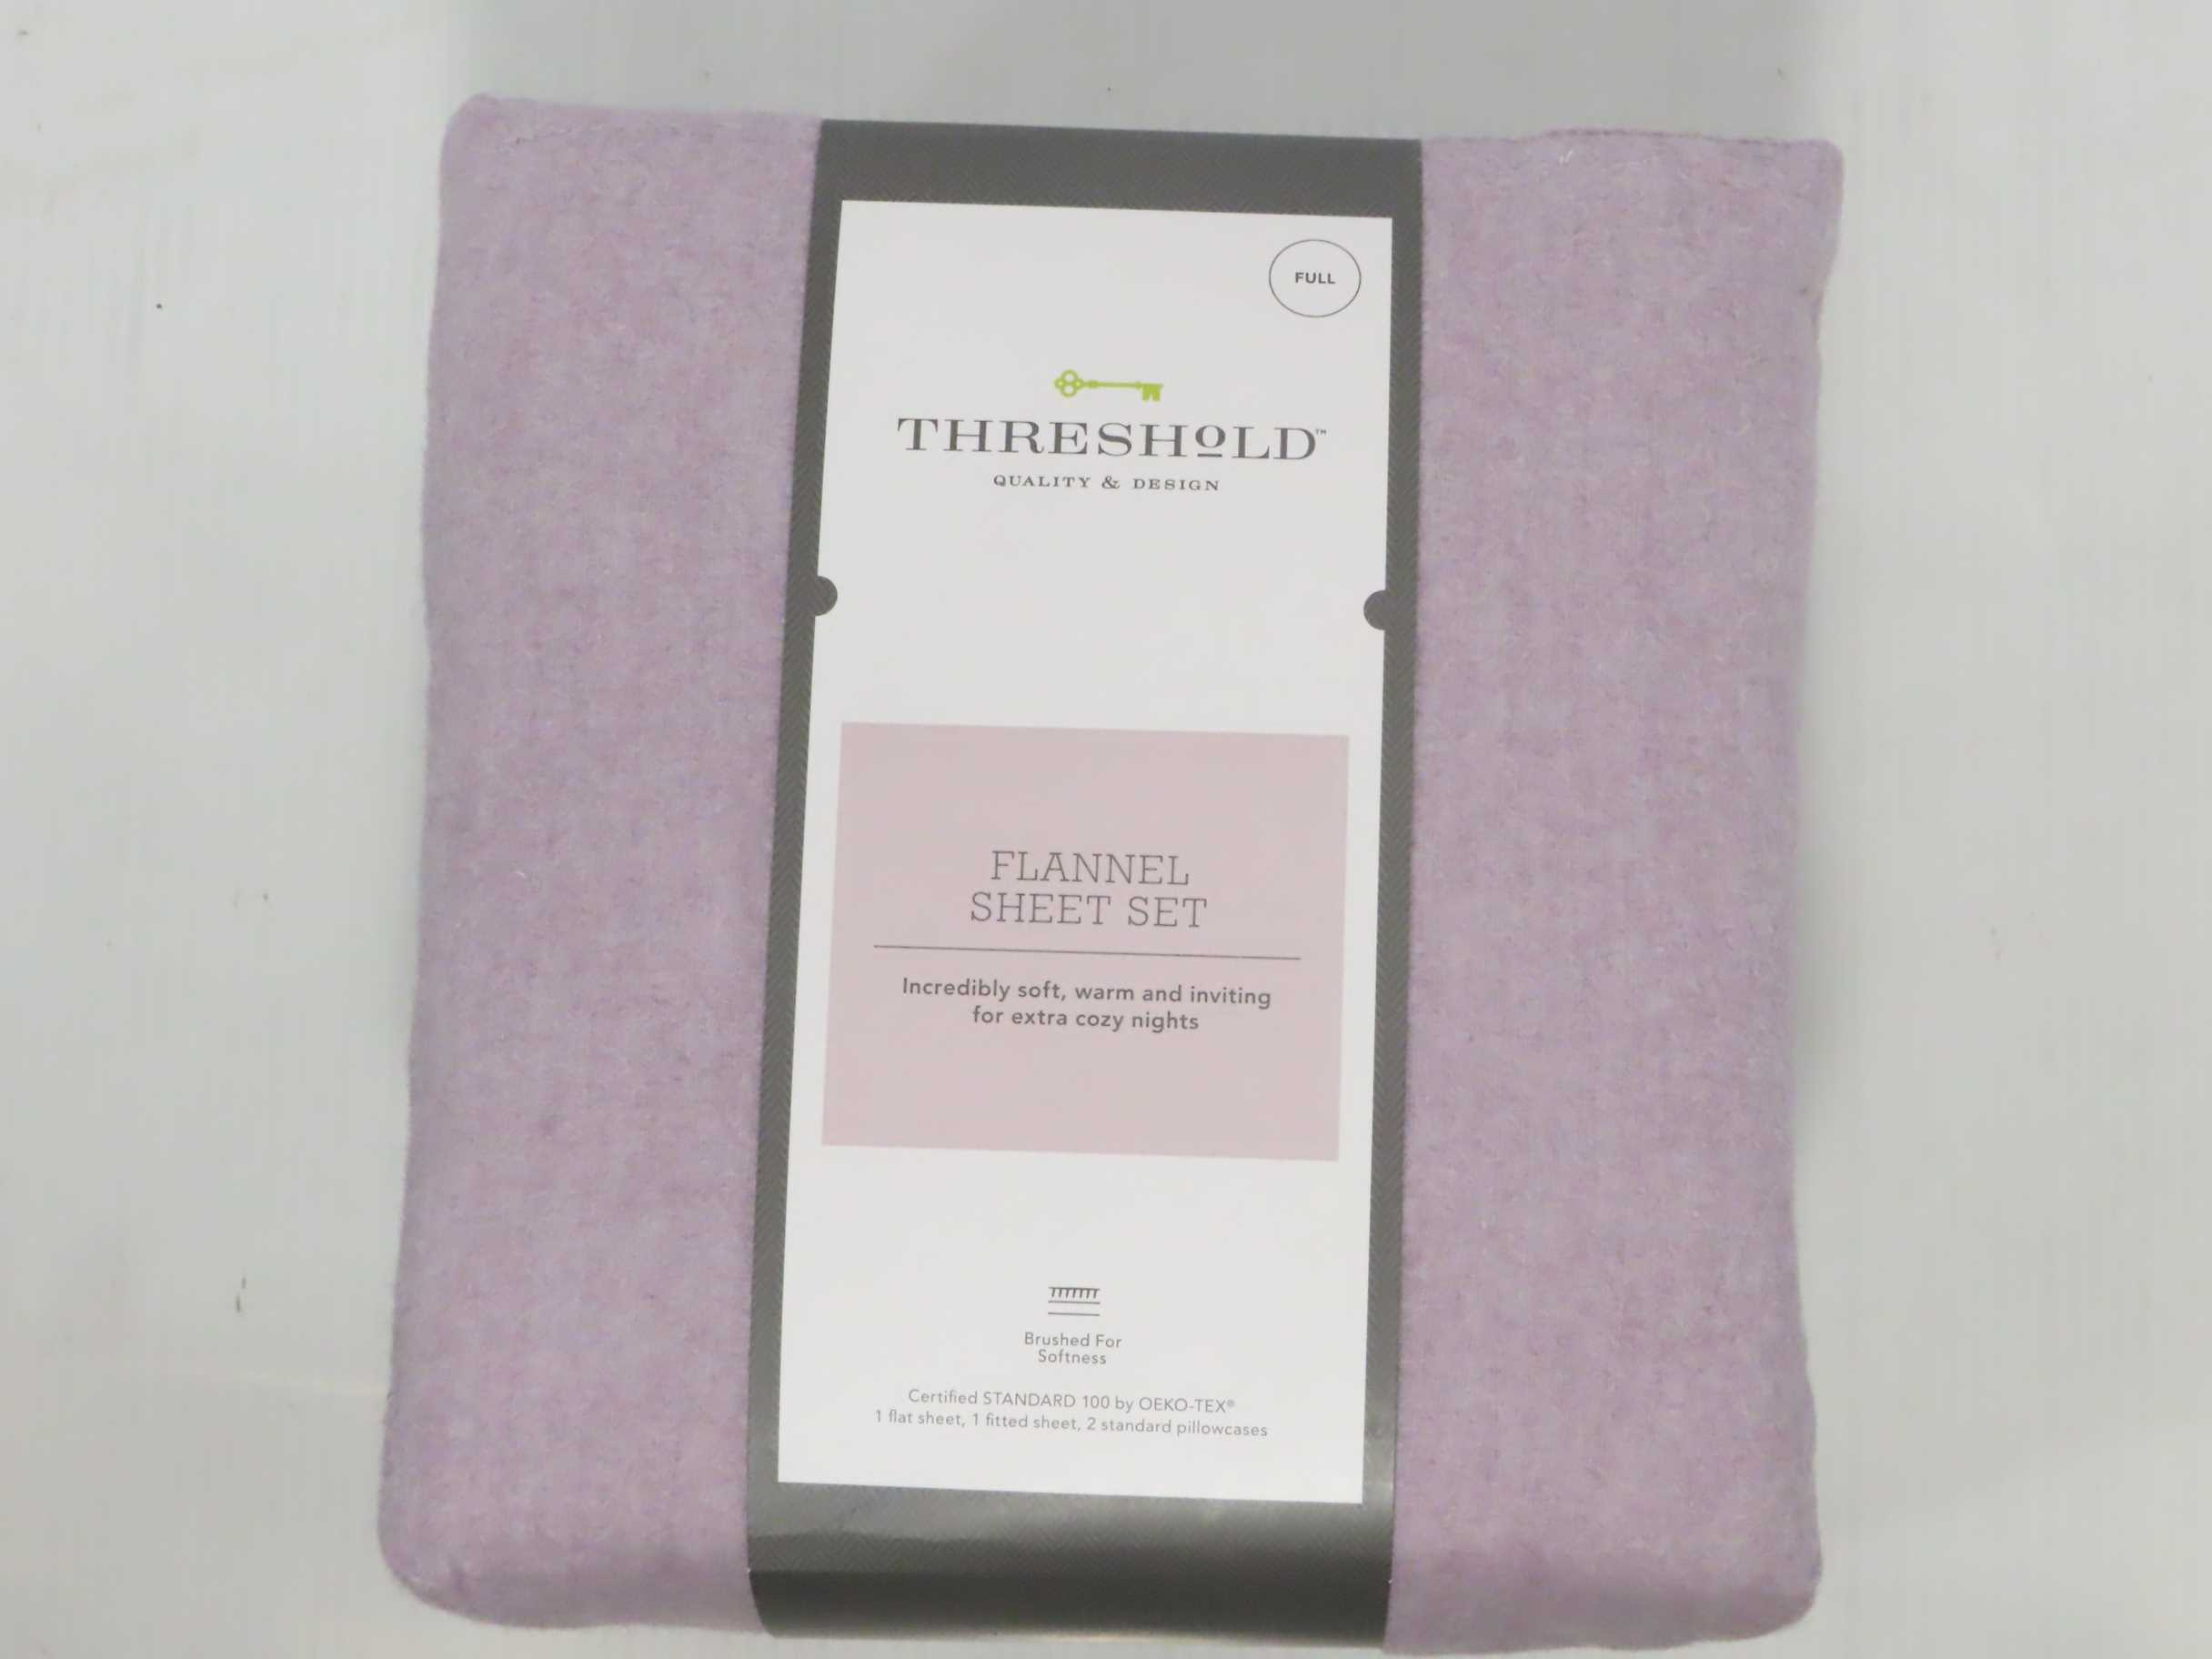 Solid Flannel Sheet Set - Threshold - FULL